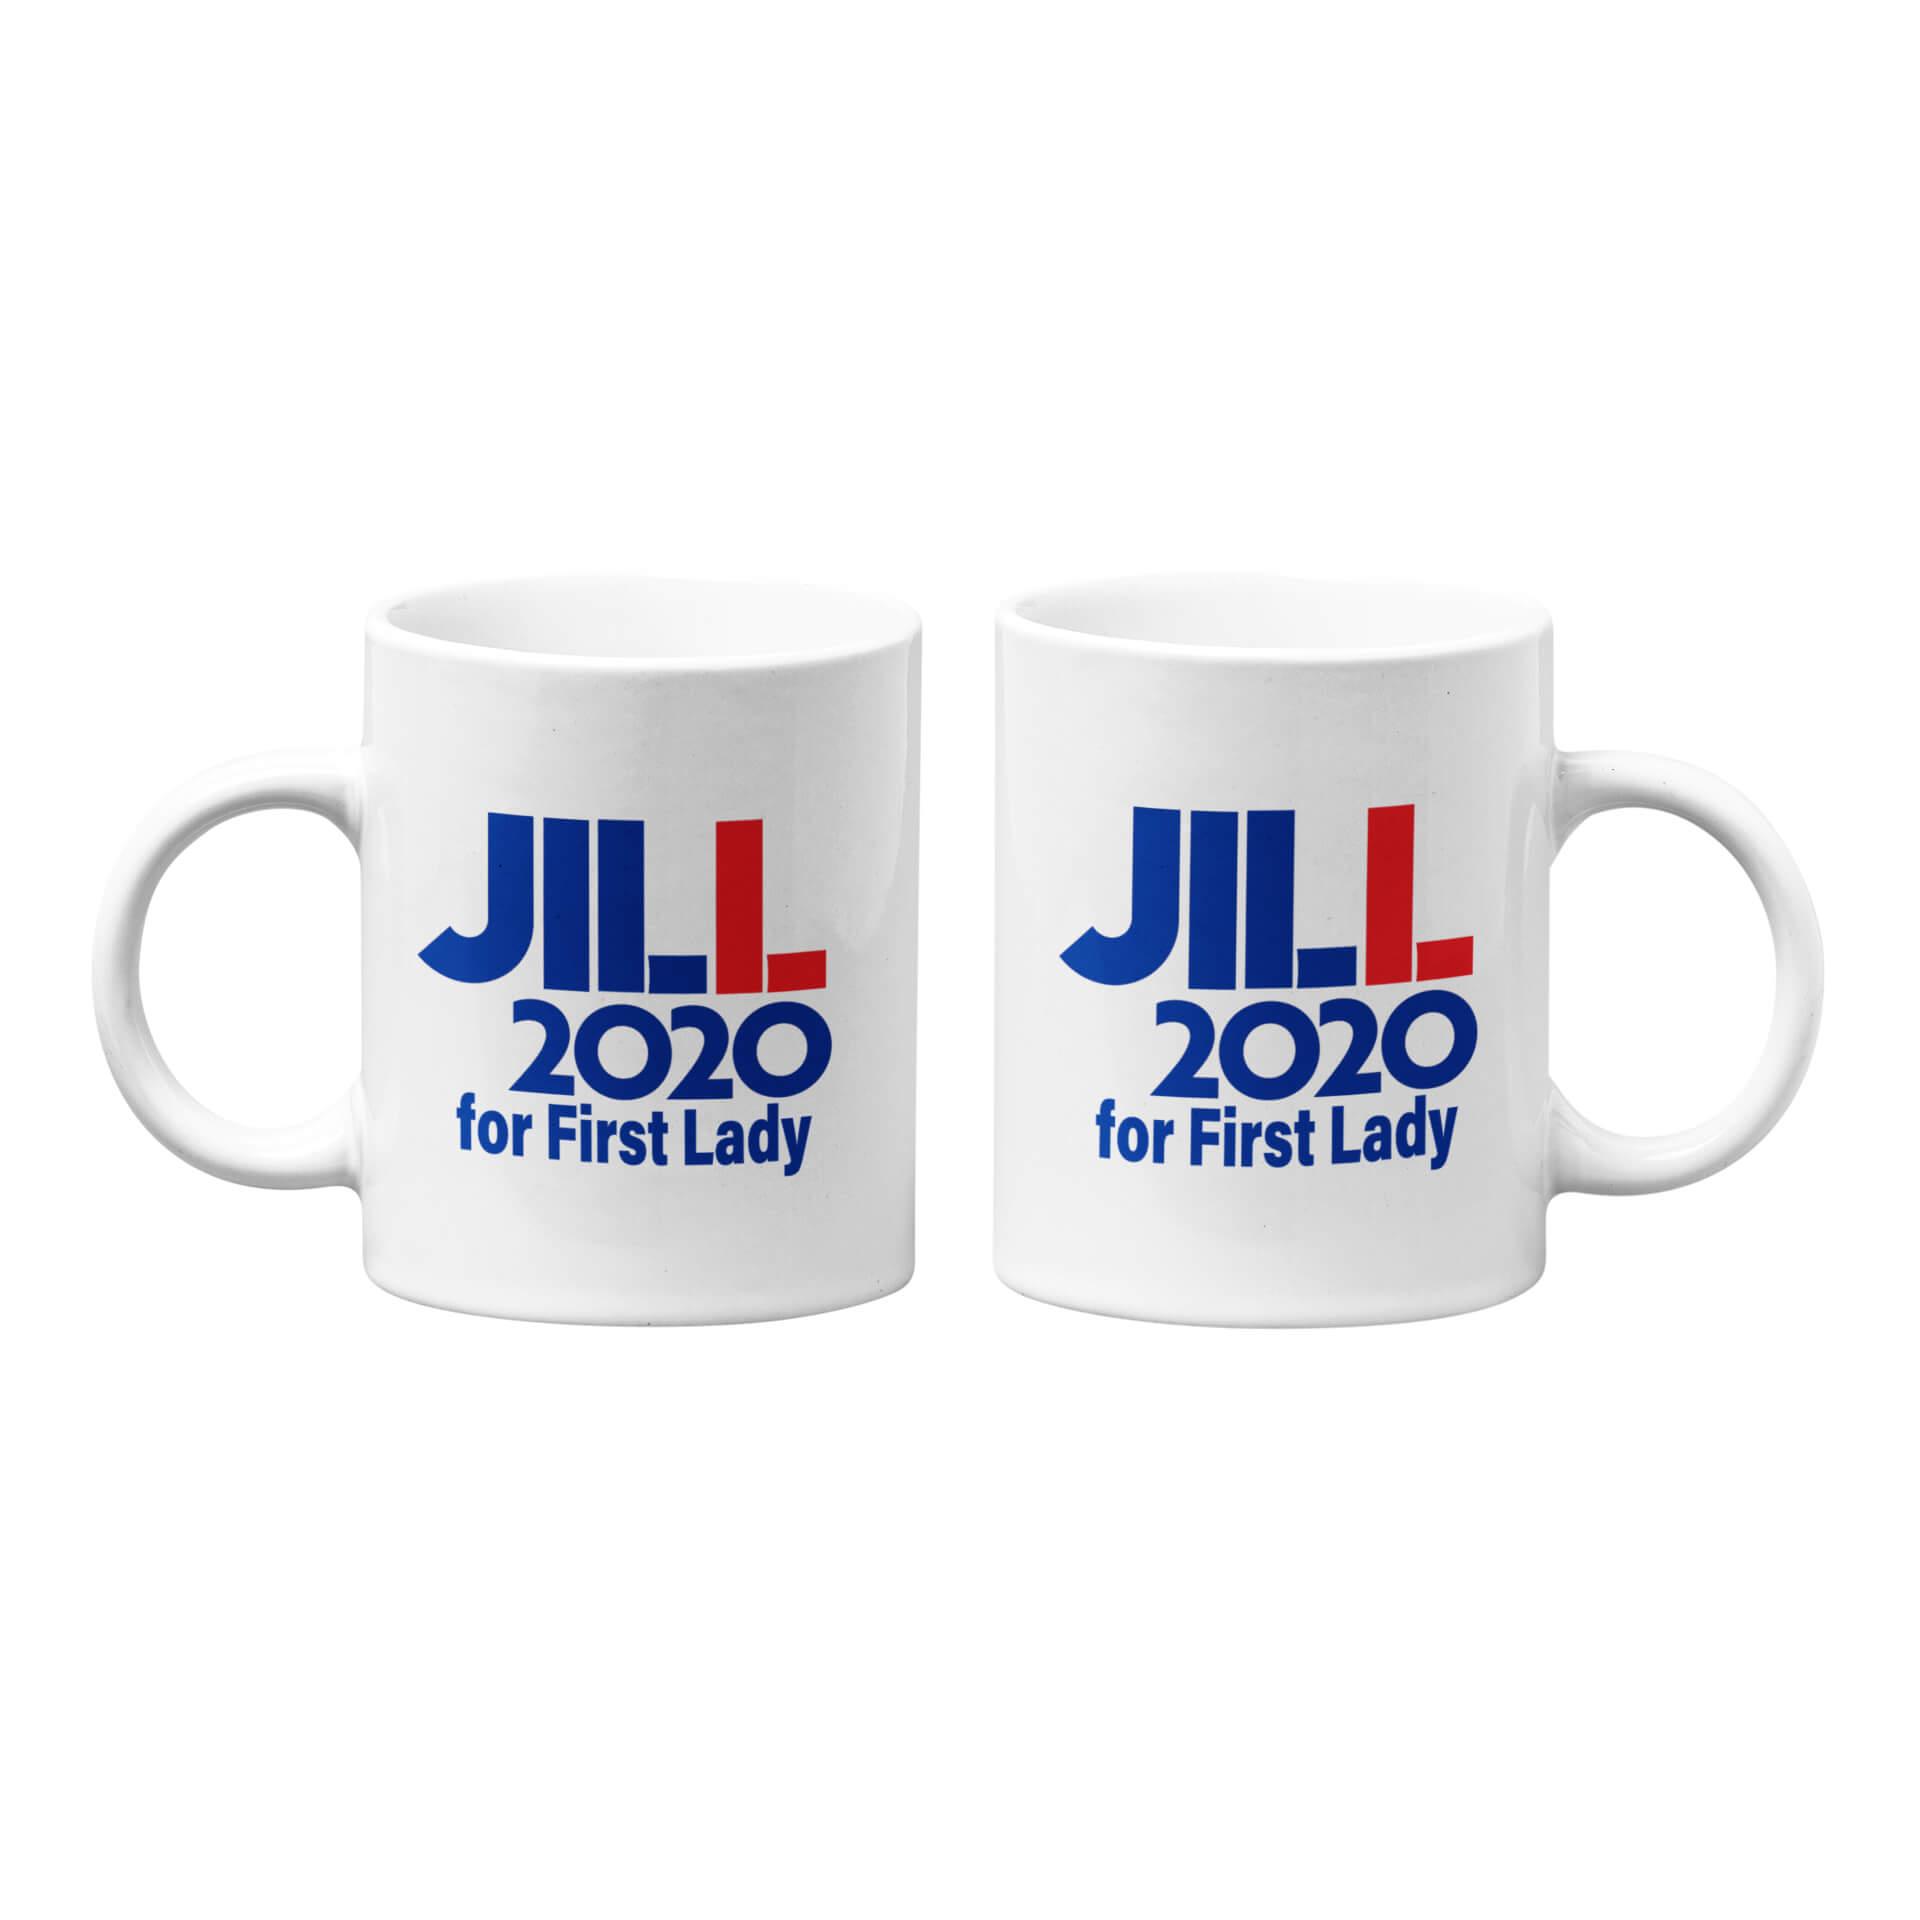 Jill 2020 for First Lady Mug